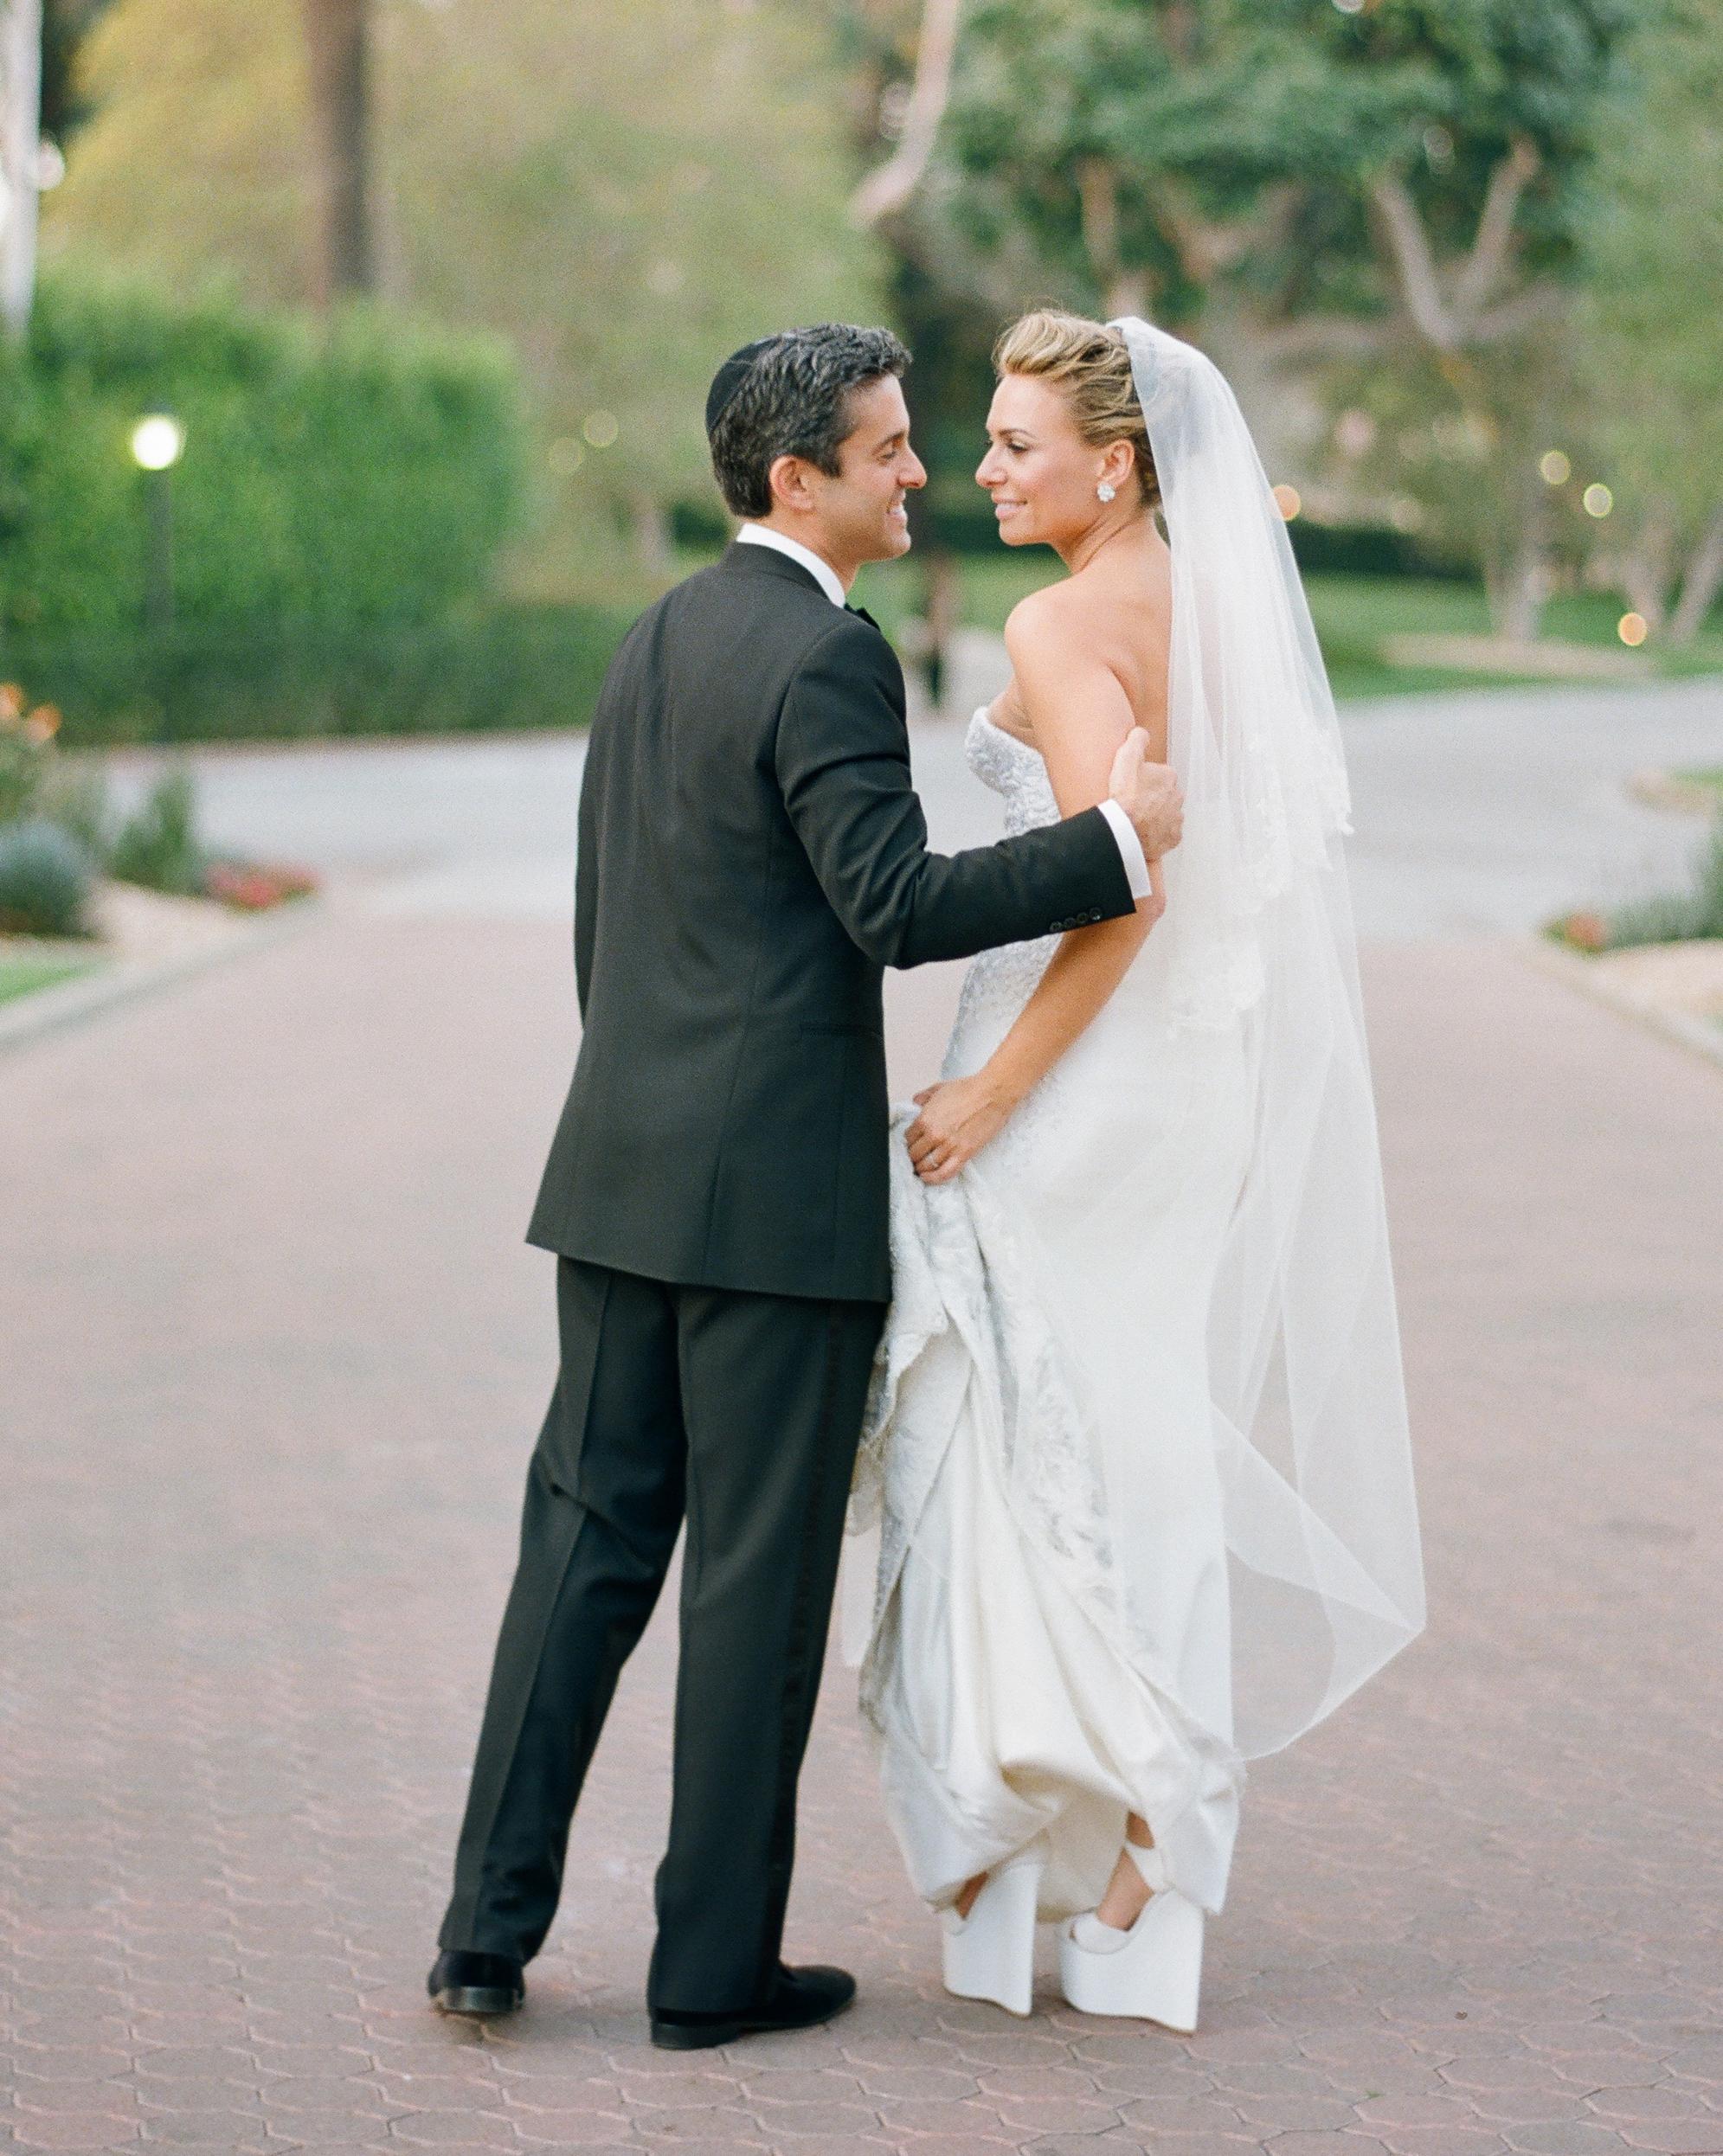 real-wedding-fall14-jojo-eric-279elizabeth-messina-ds111226-0814.jpg